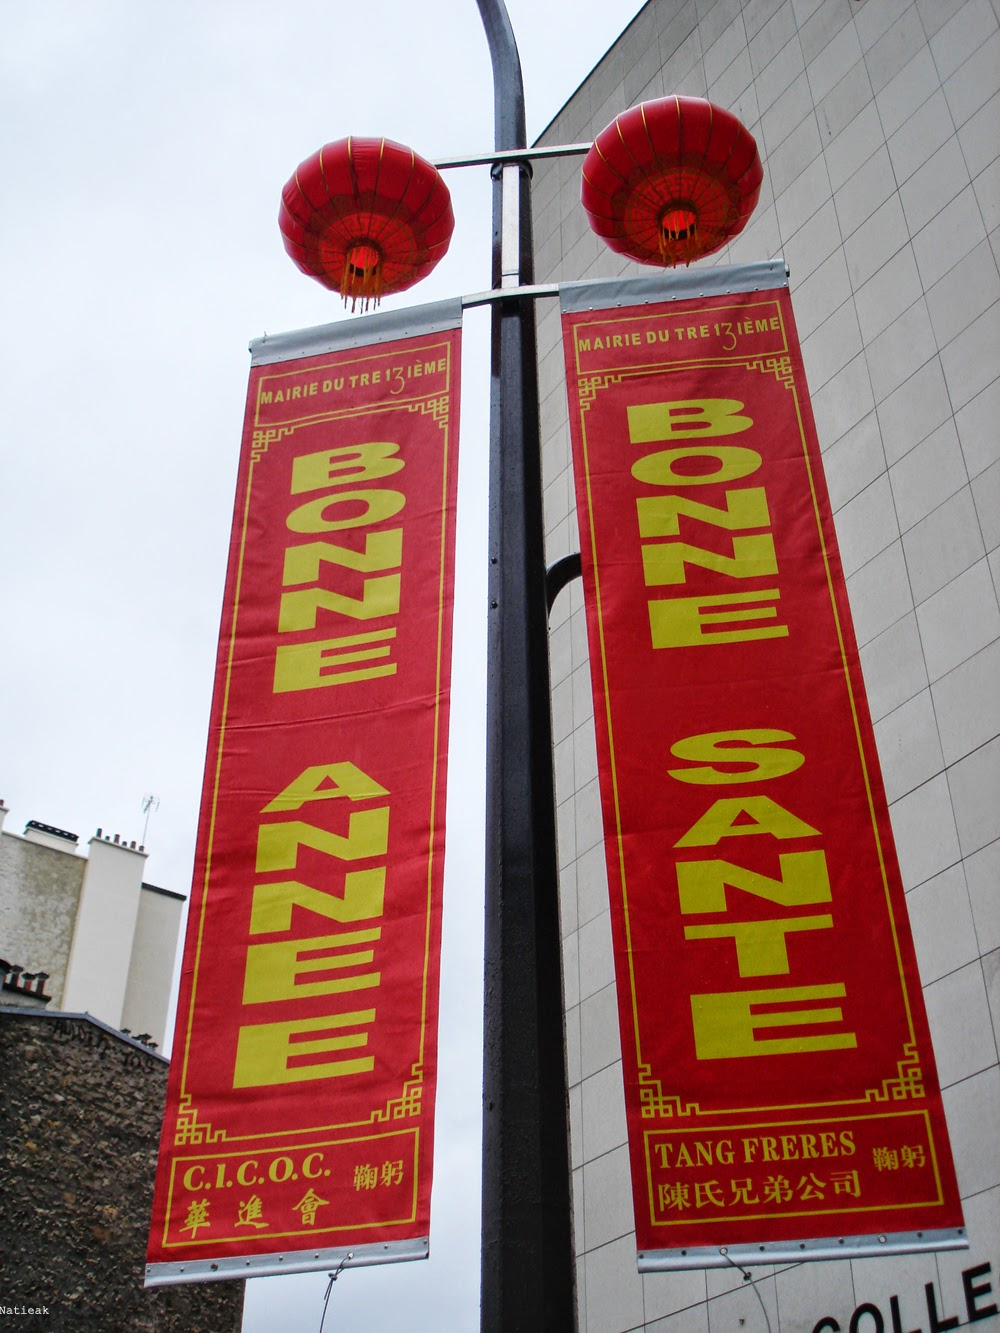 Nouvel an Le nouvel an chinois